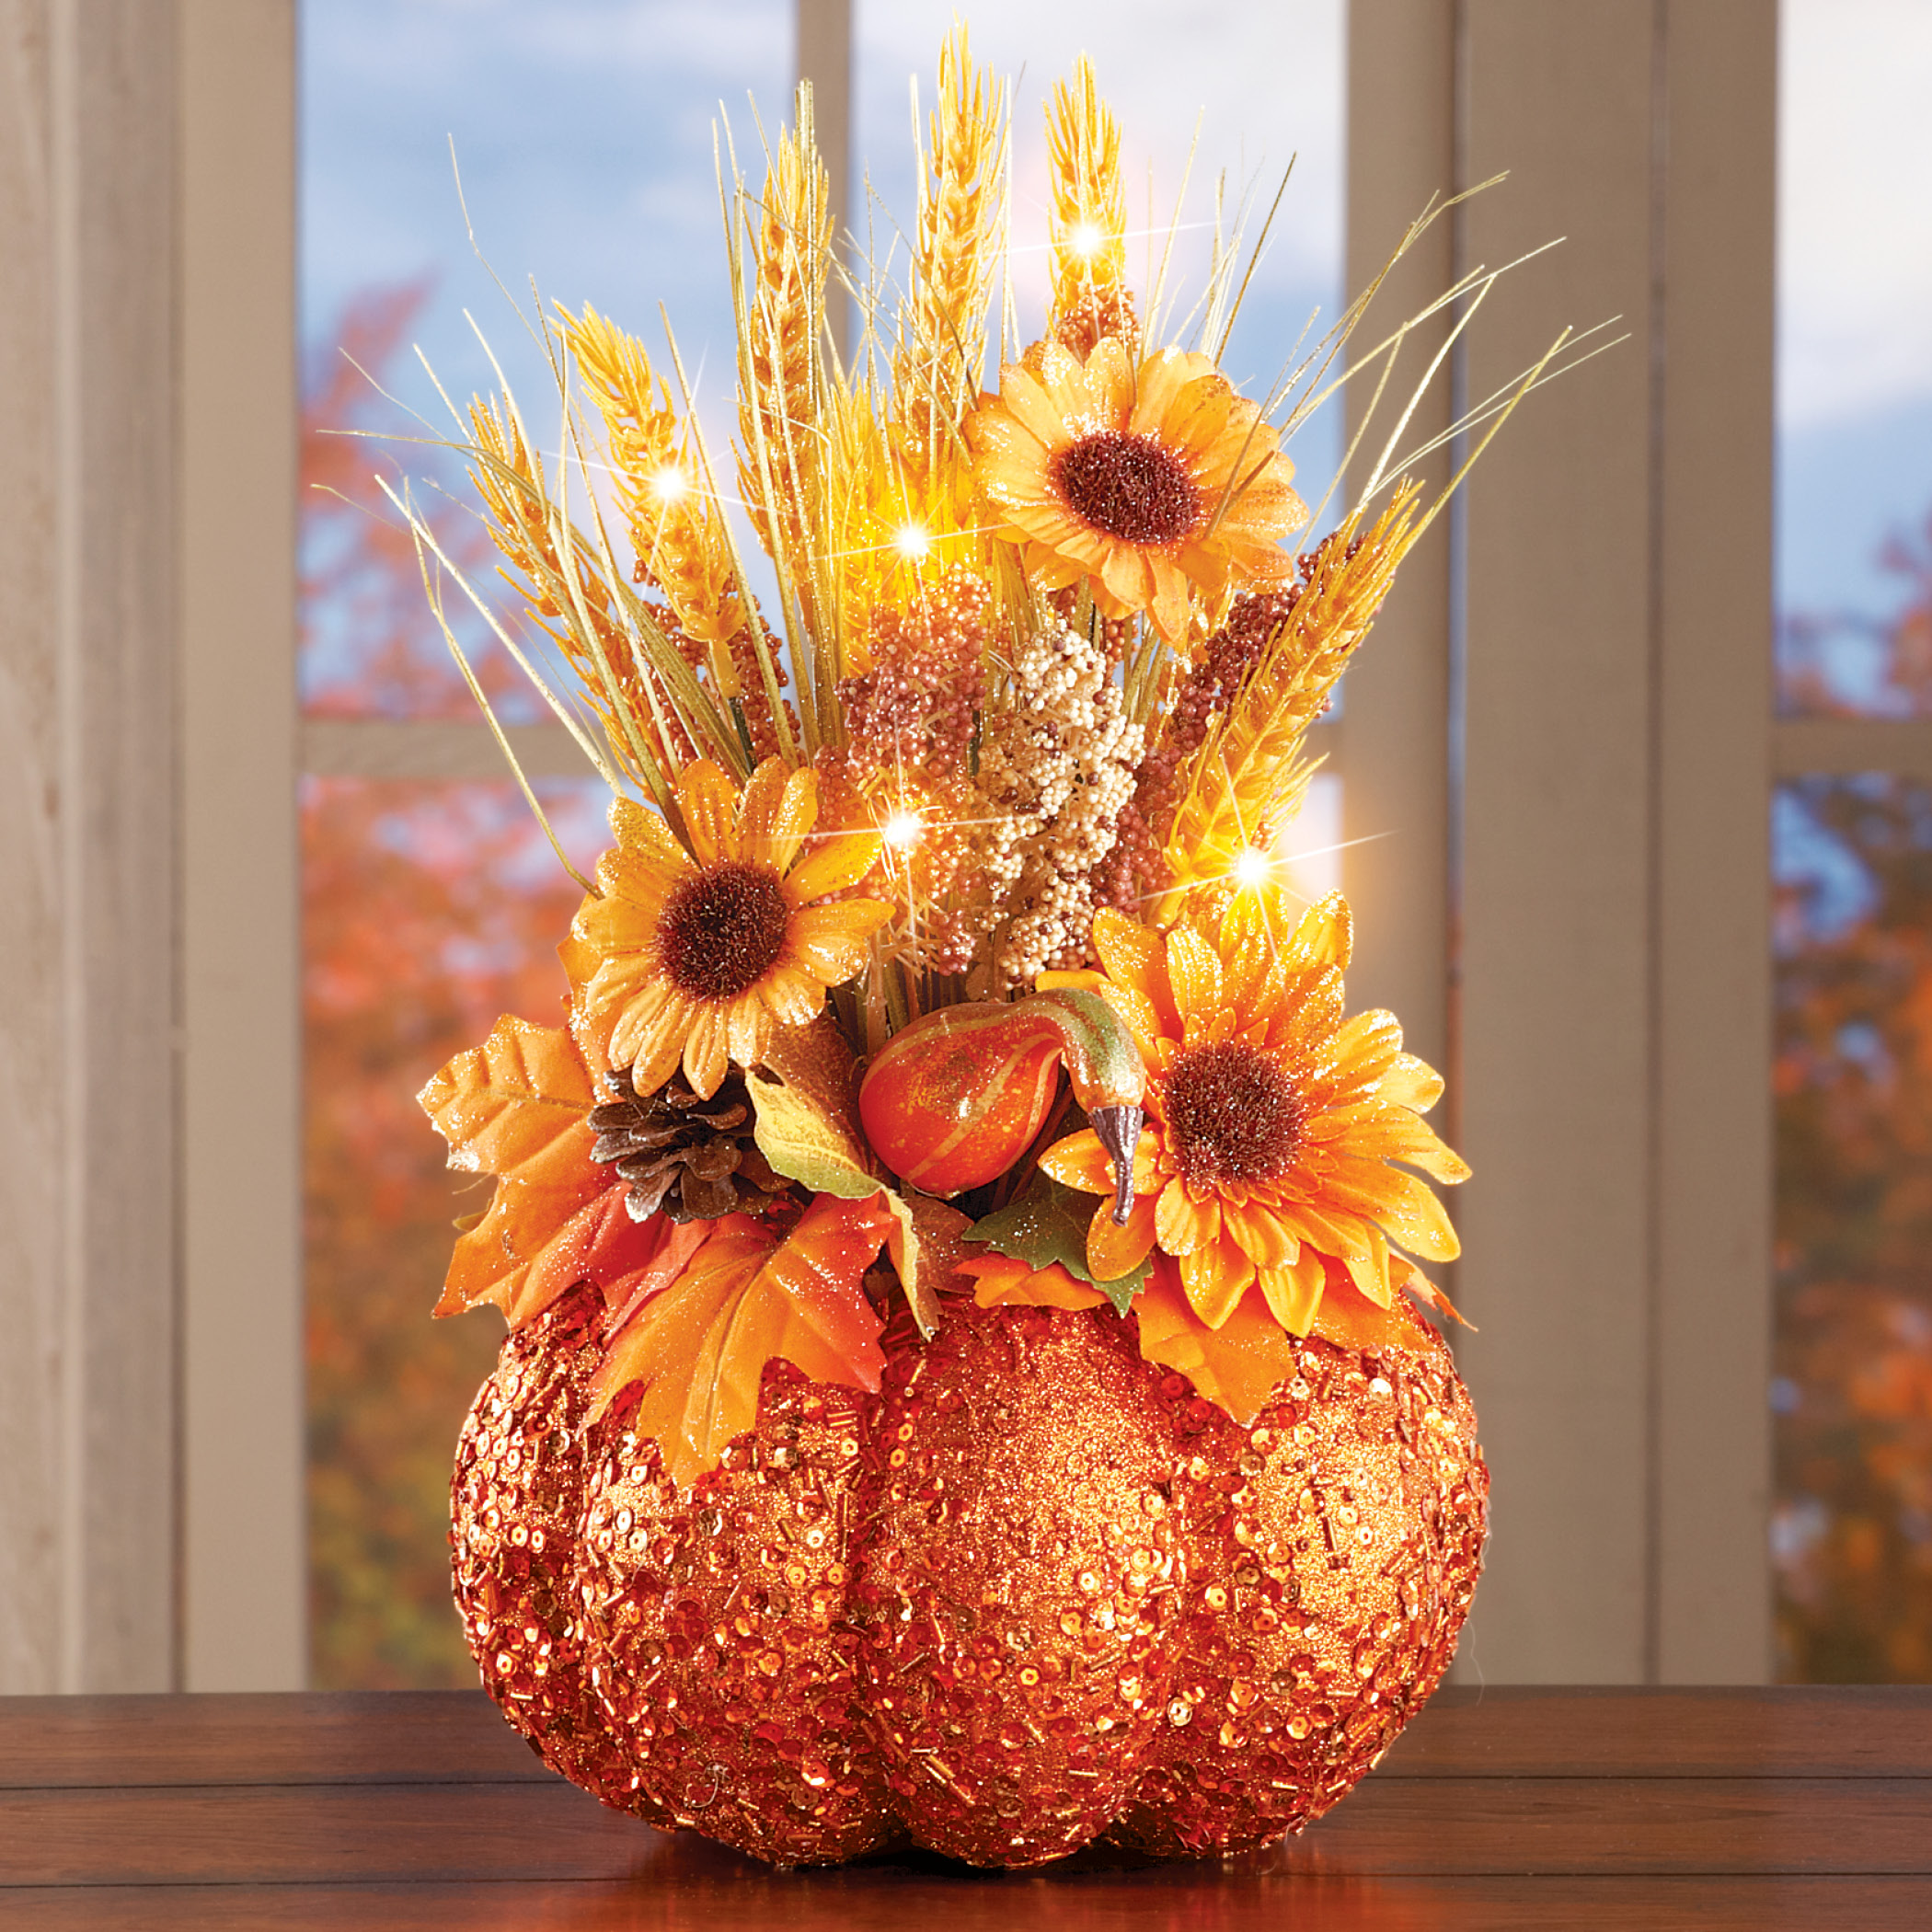 Fall Decor Collections Etc Glittered Light Up Pumpkin Harvest Centerpiece for Thanksgiving